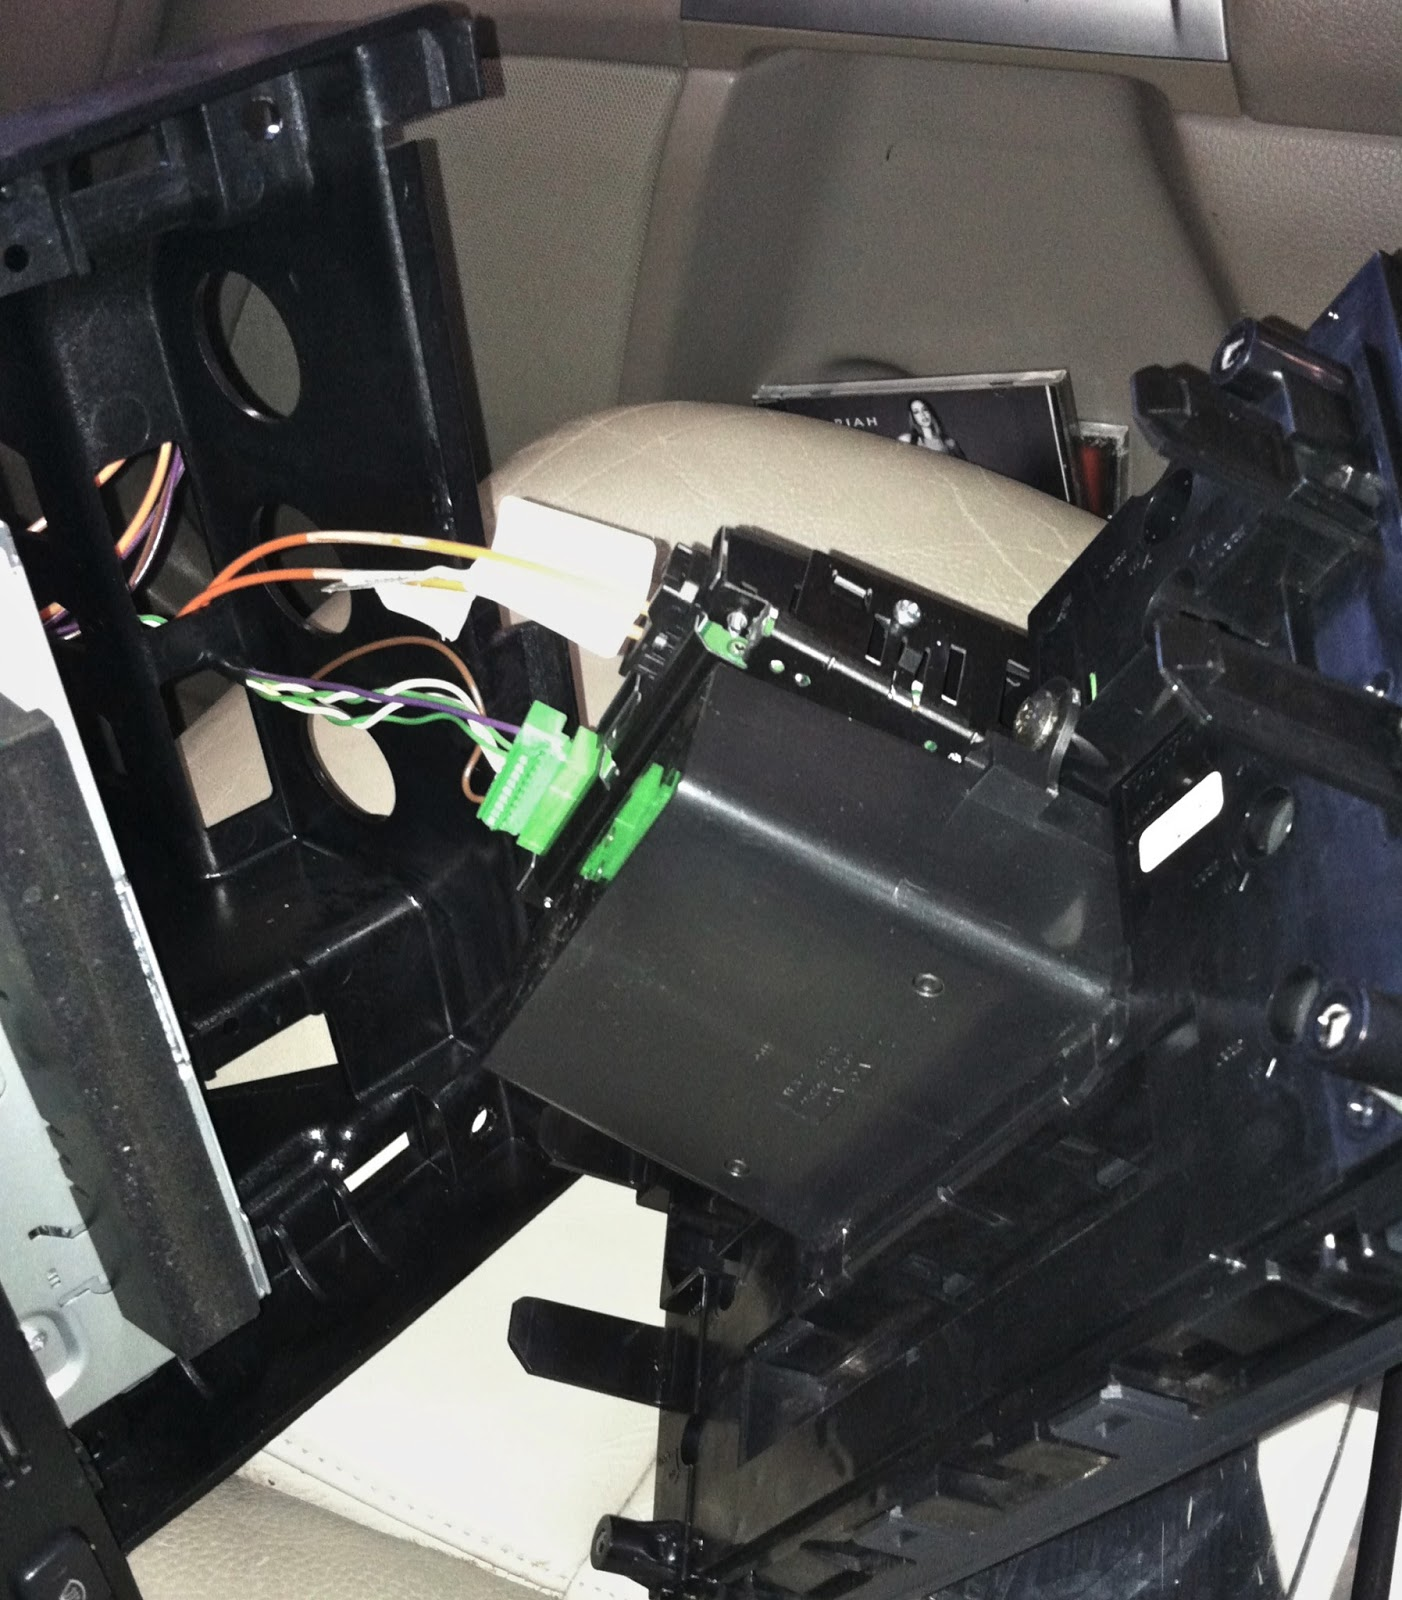 medium resolution of installing aftermarket stereo in volvo xc90